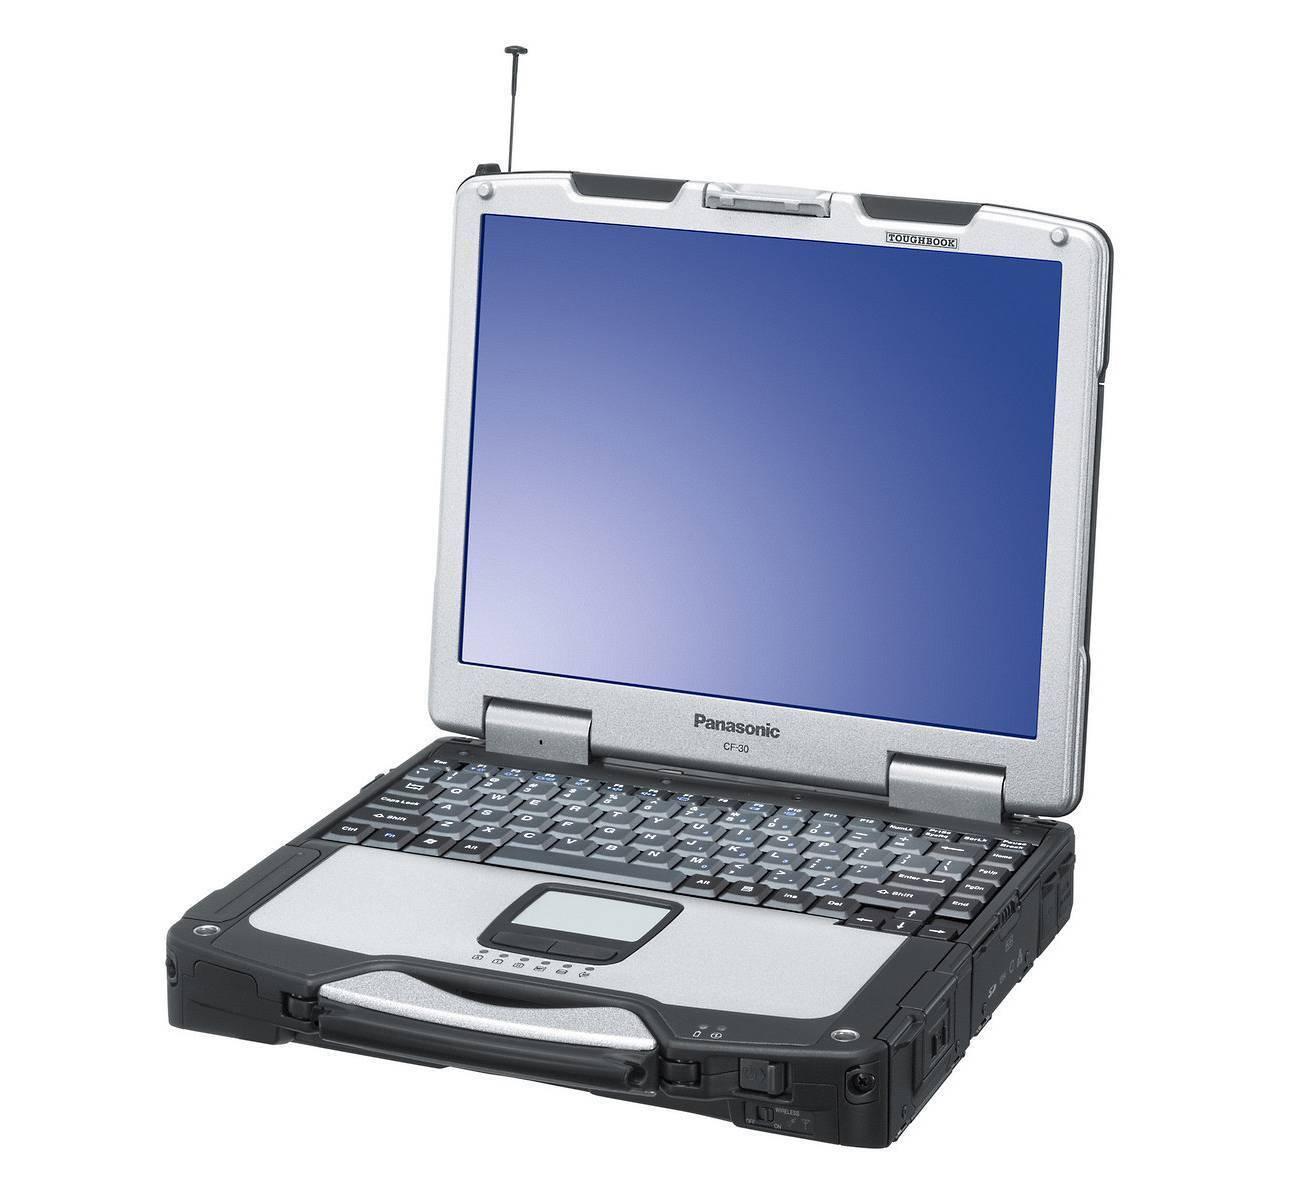 Panasonic Toughbook CF-30 Laptop  -1.6Ghz CPU , 2GB RAM -- NO HDD, BATTERY & AC